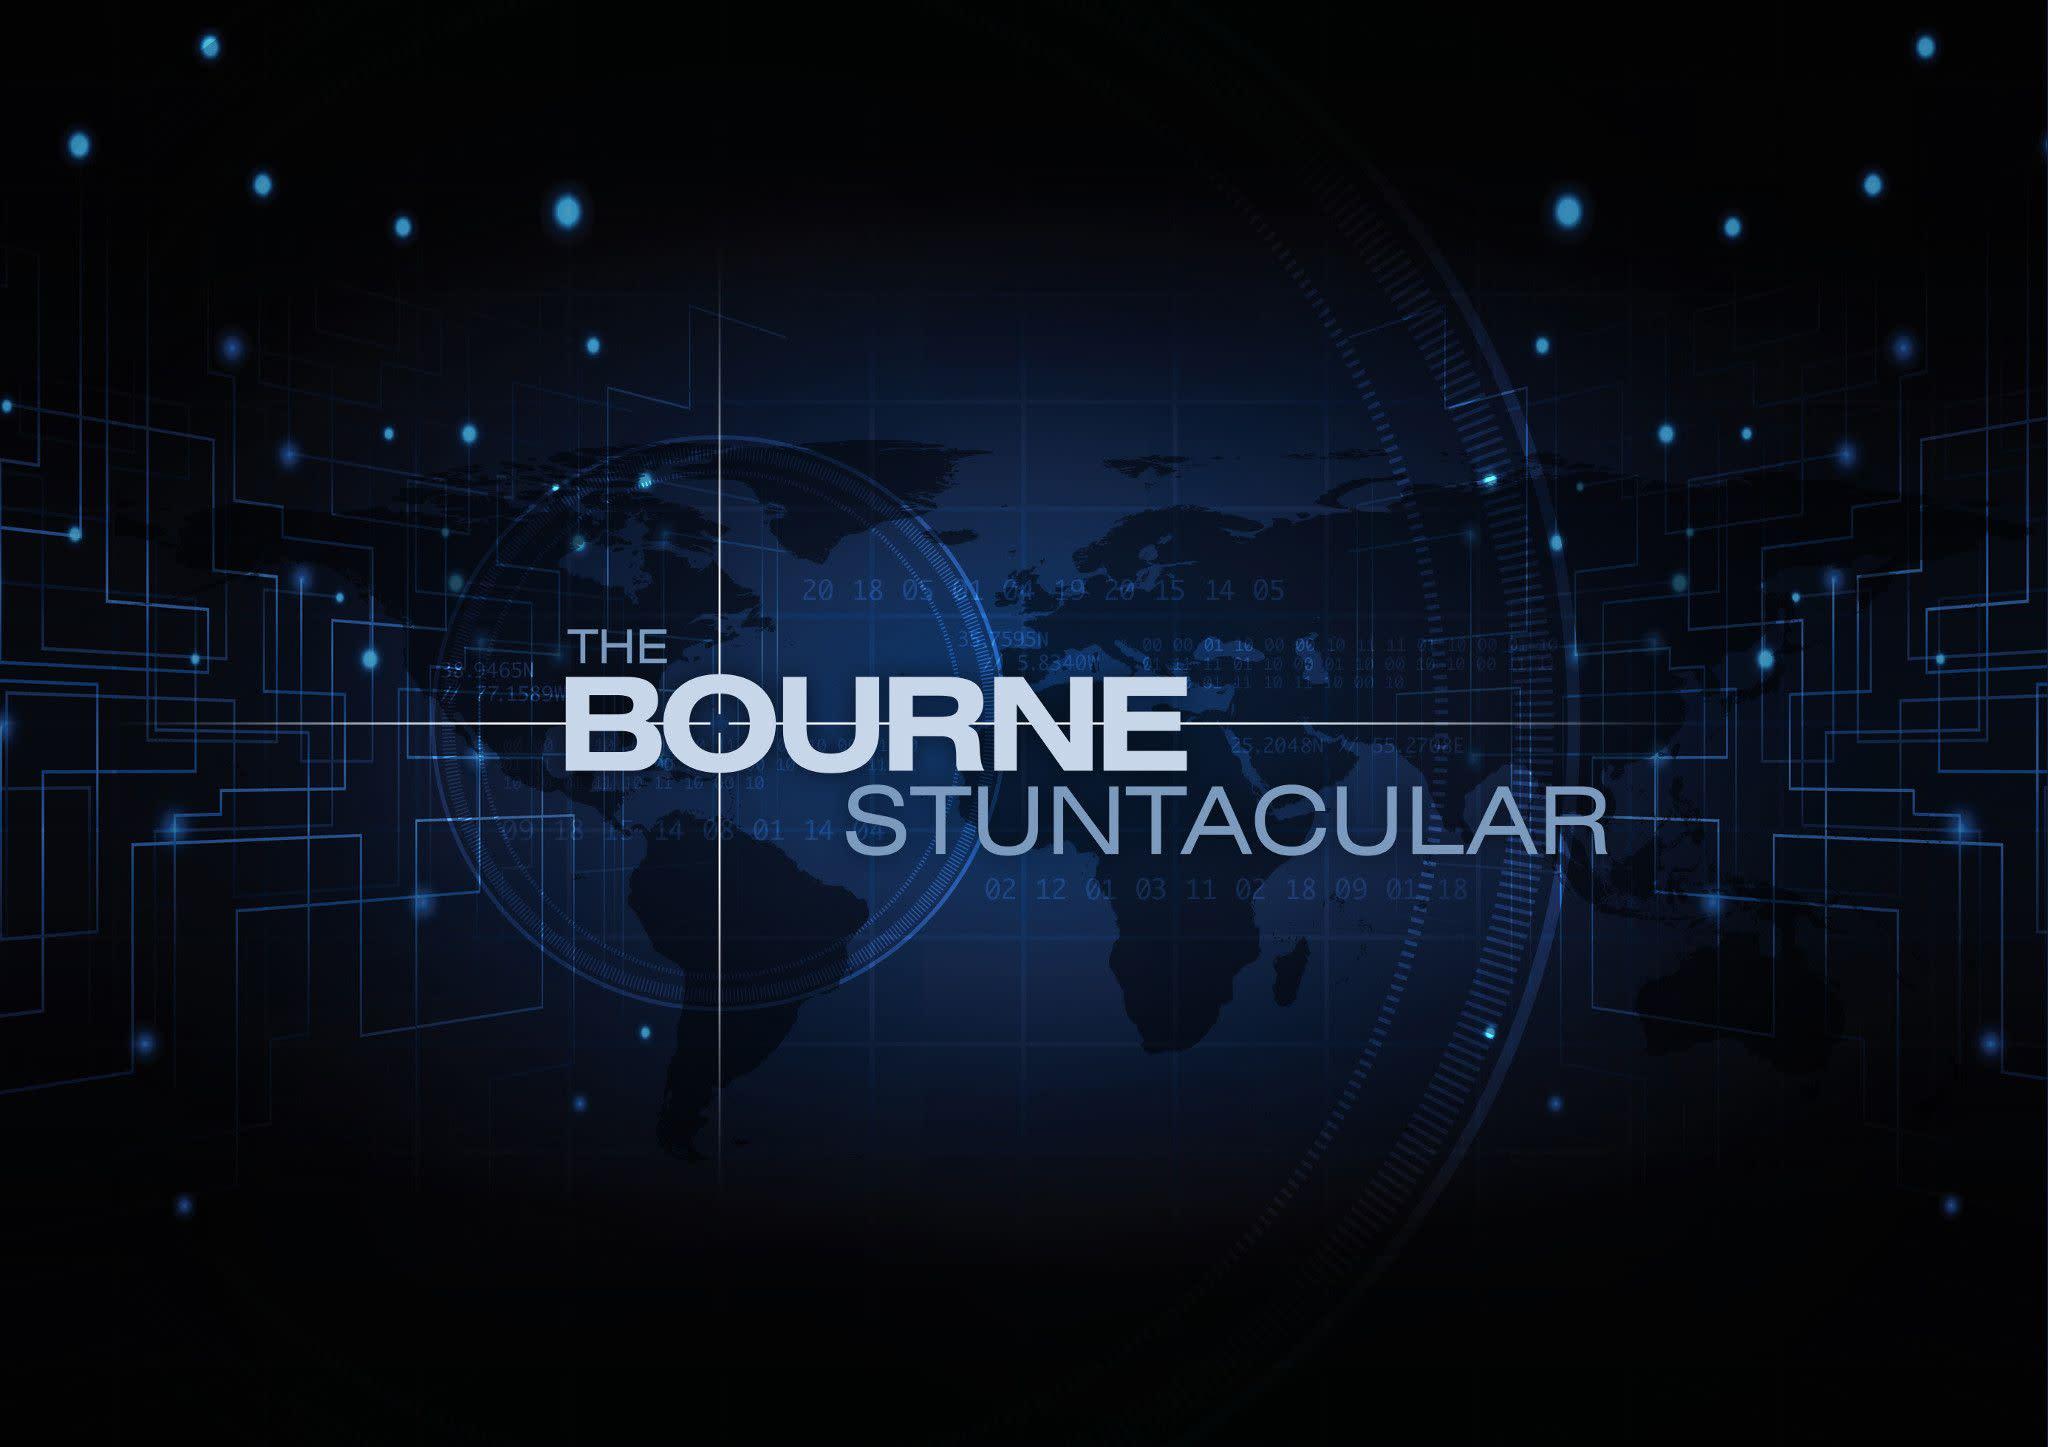 Universal Orlando Resort Is Bringing The Bourne Stuntacular to Universal Studios Florida in Spring 2020